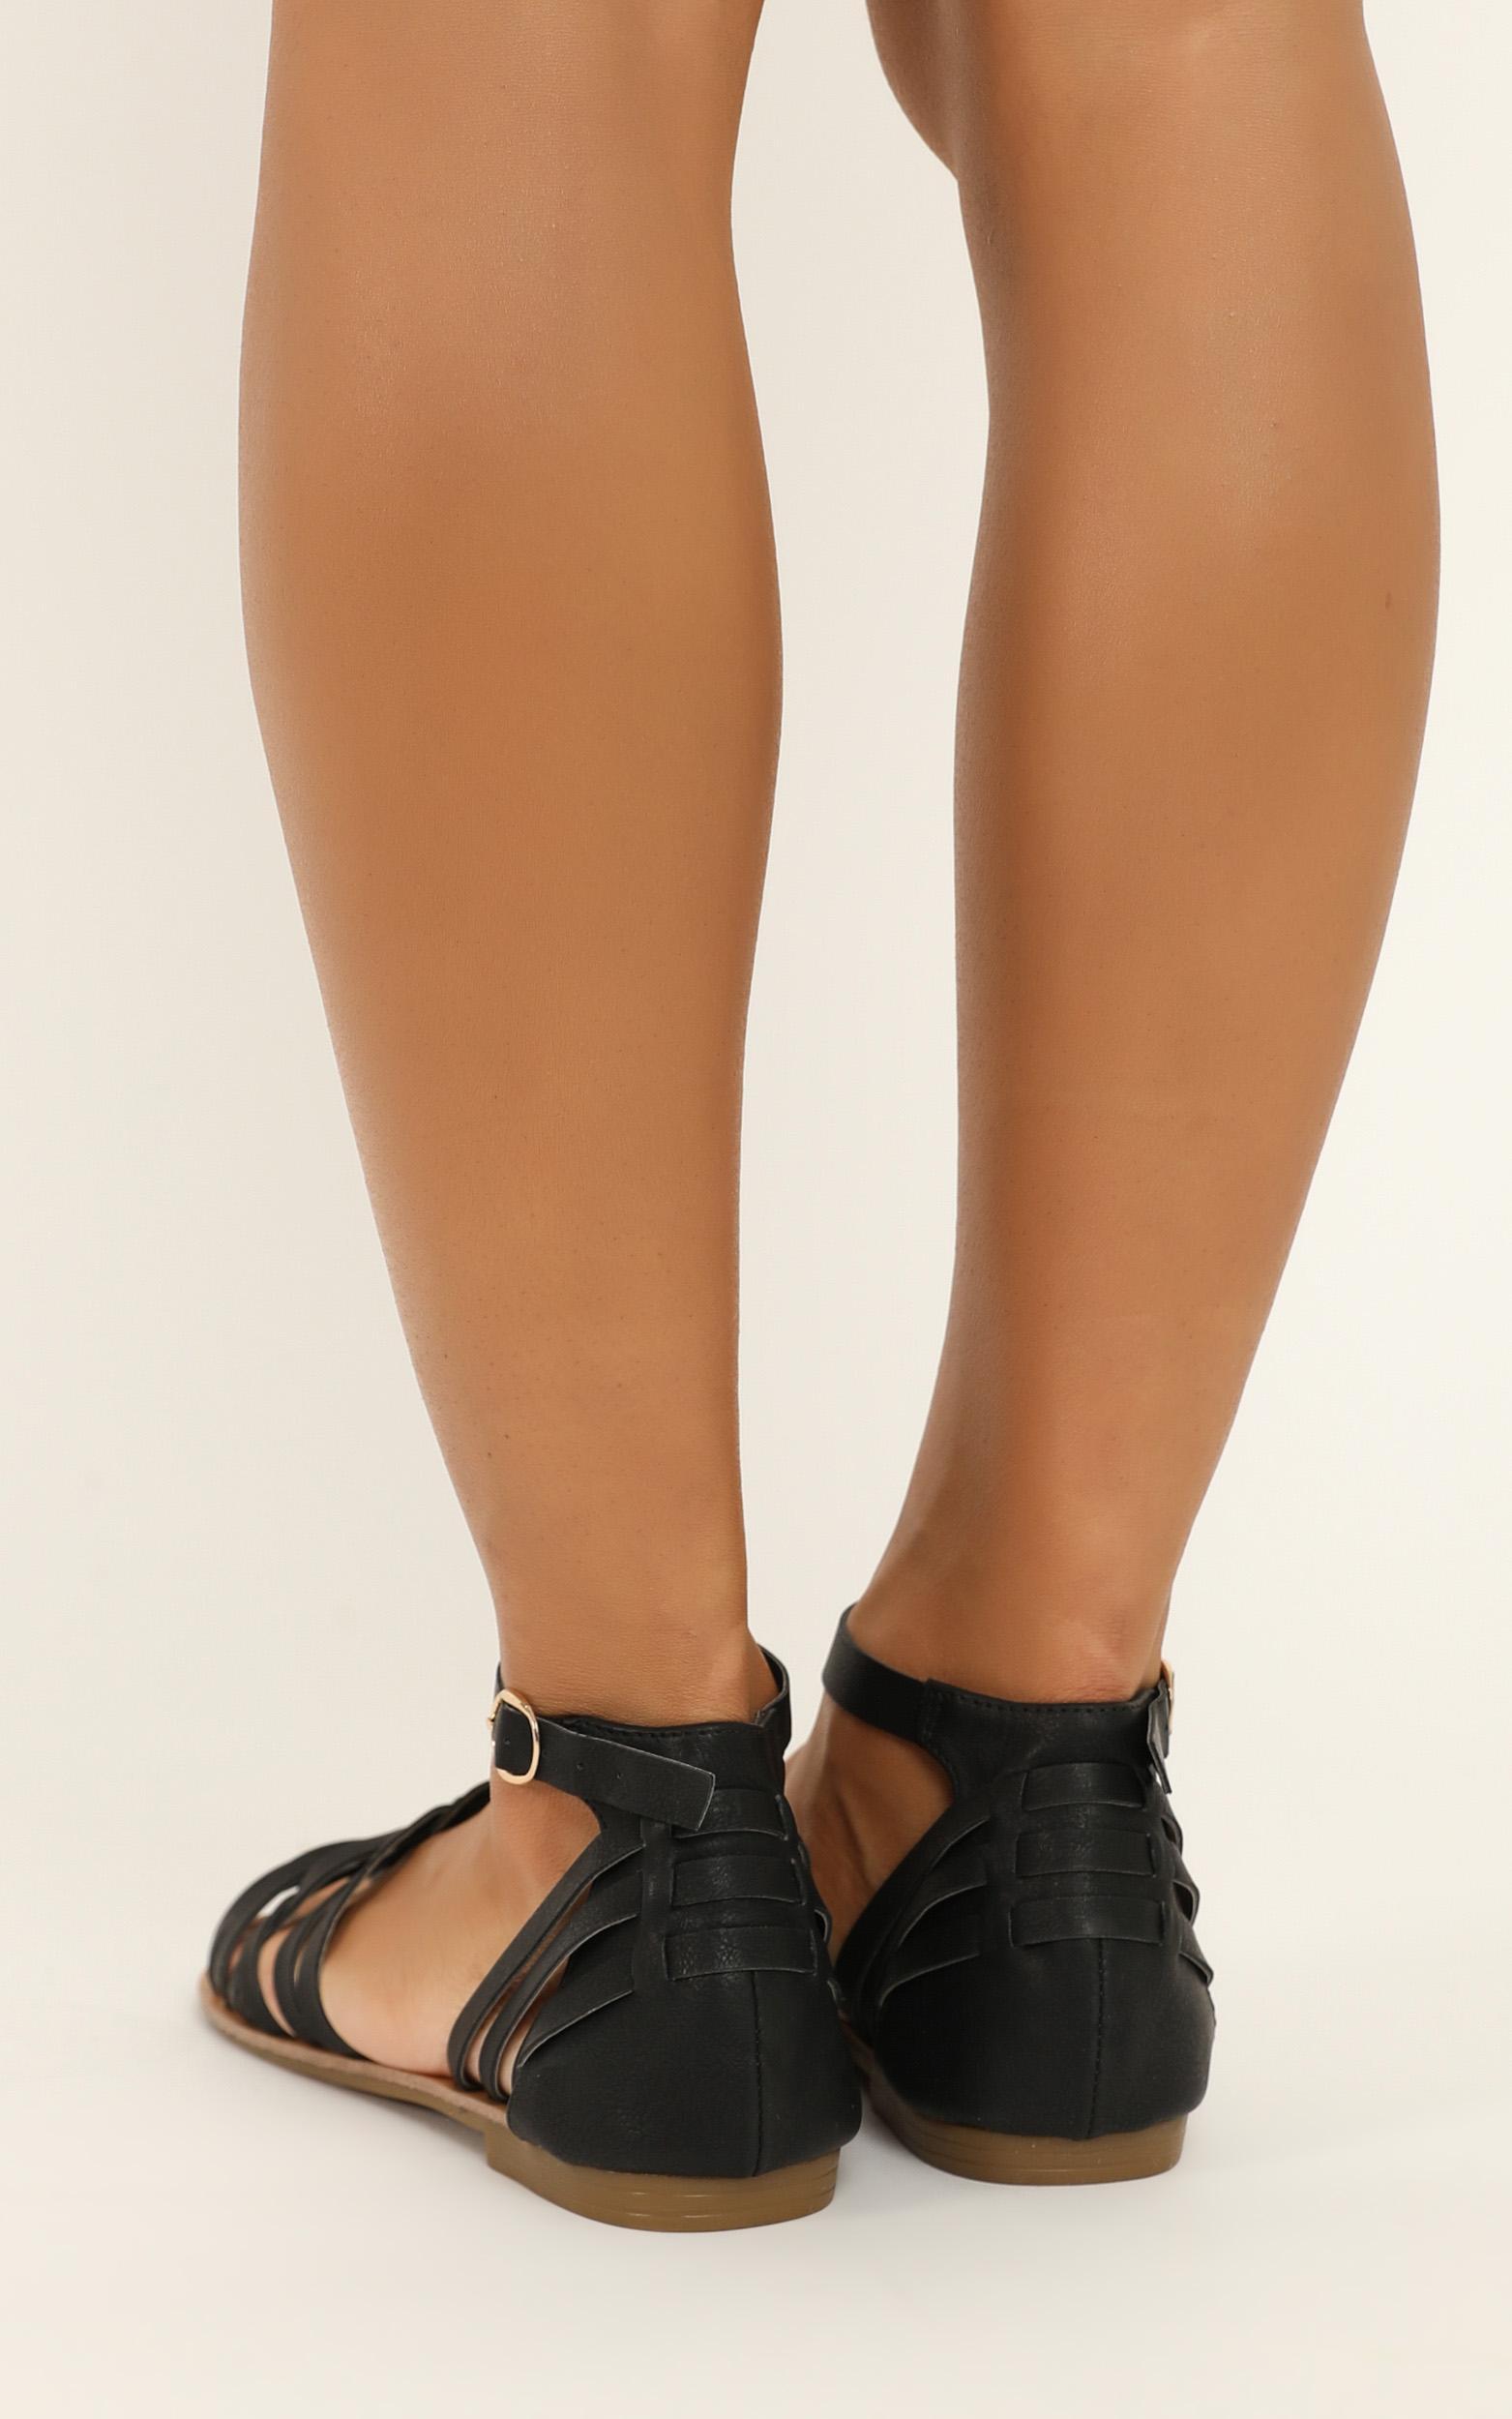 Verali - San Marco Sandals in black smooth - 10, Black, hi-res image number null